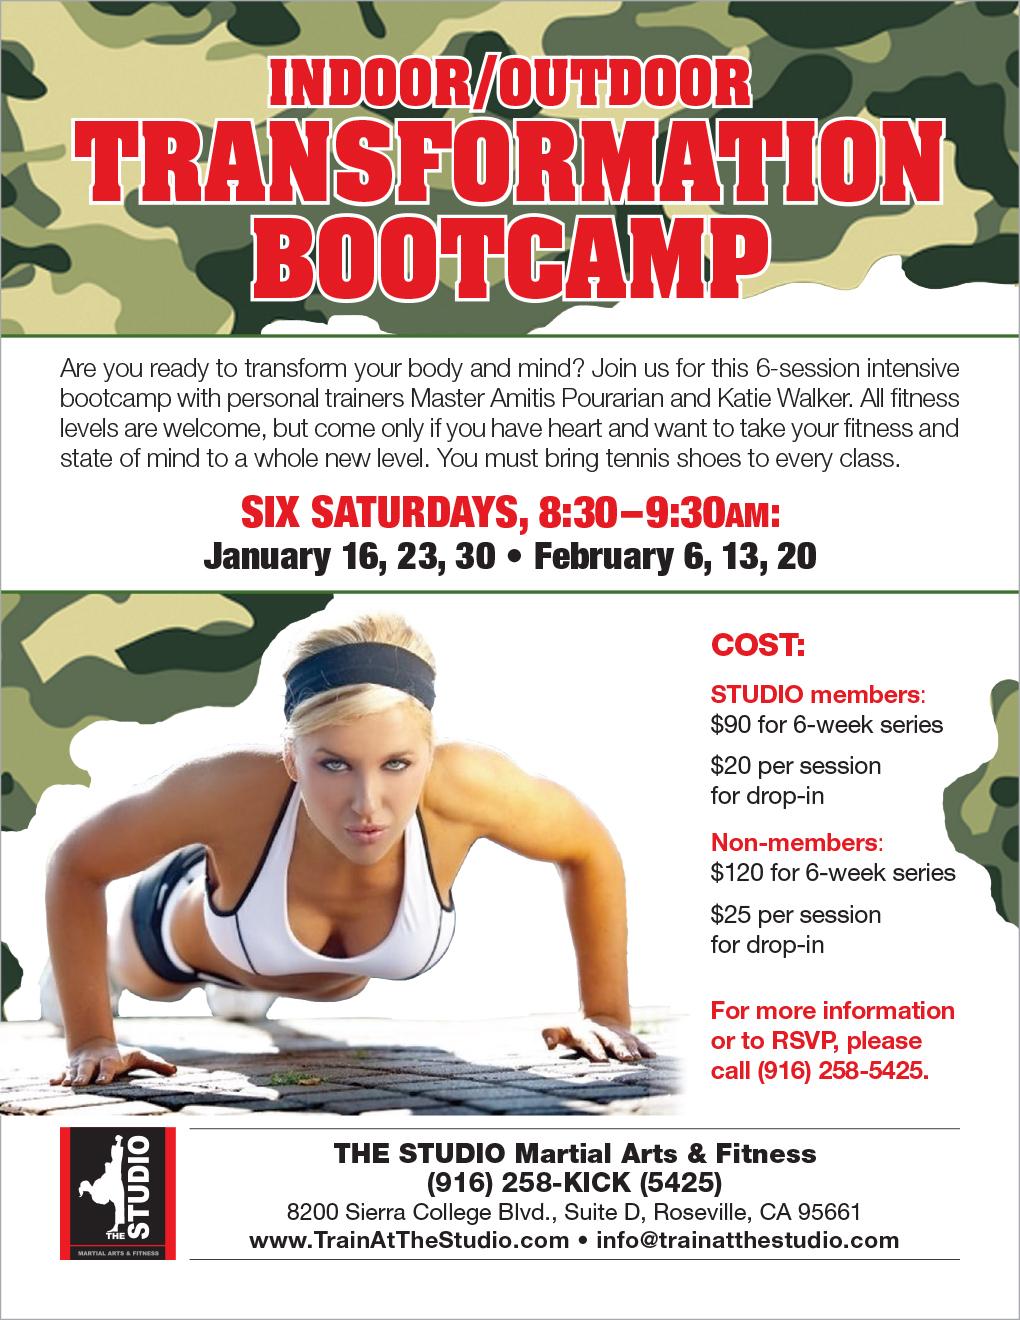 jan  16 outdoor transformation bootcamp